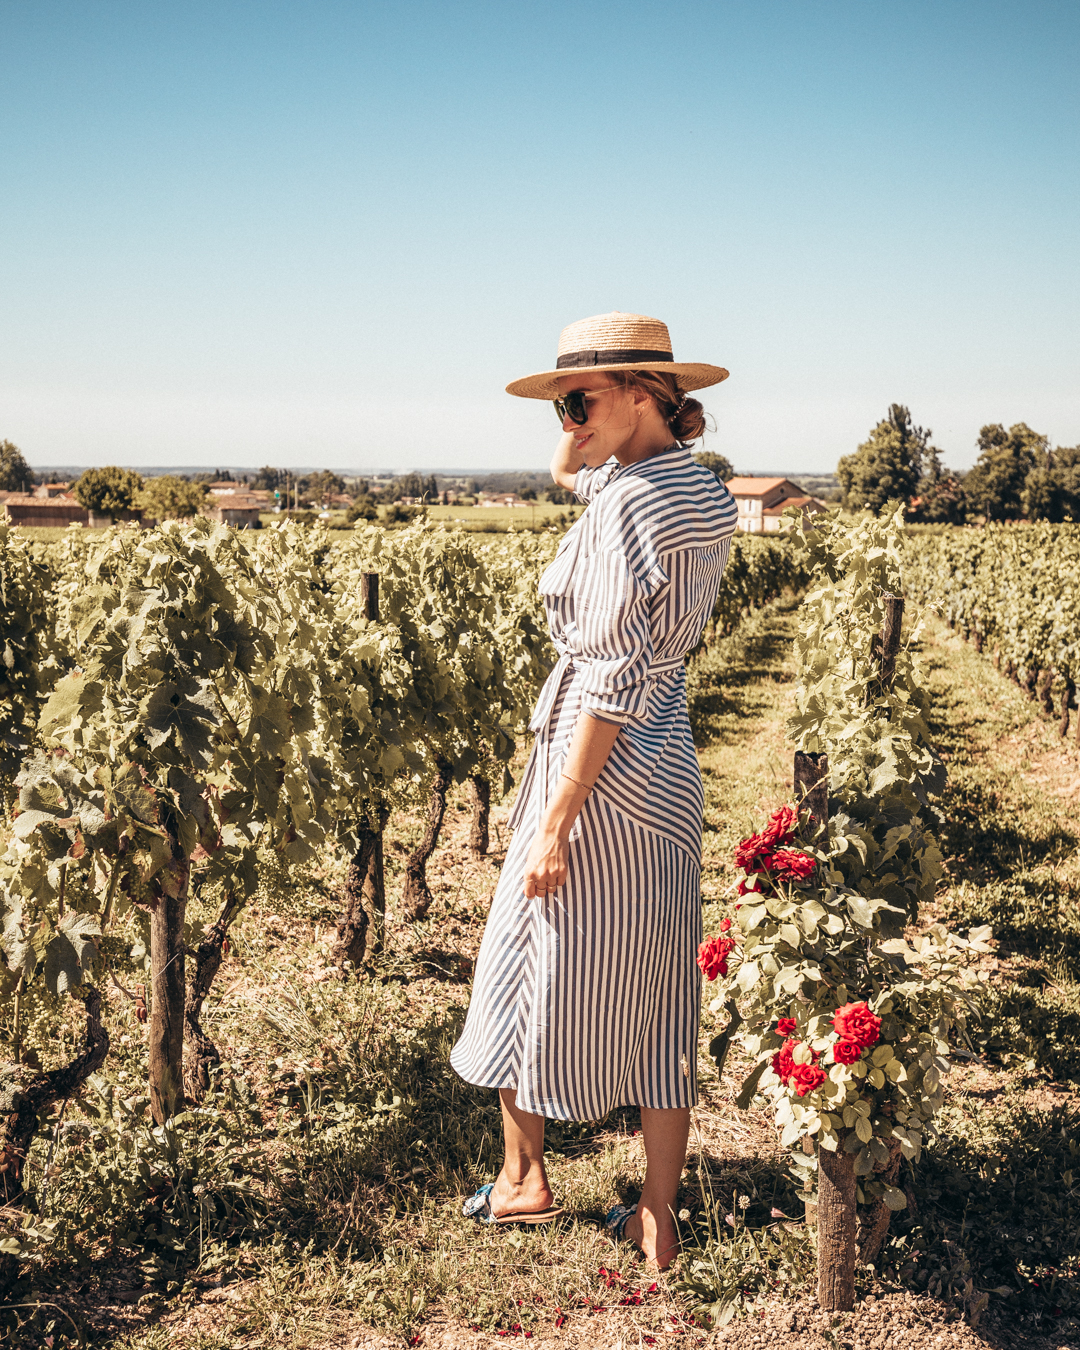 bordeaux winery wine yard grapes